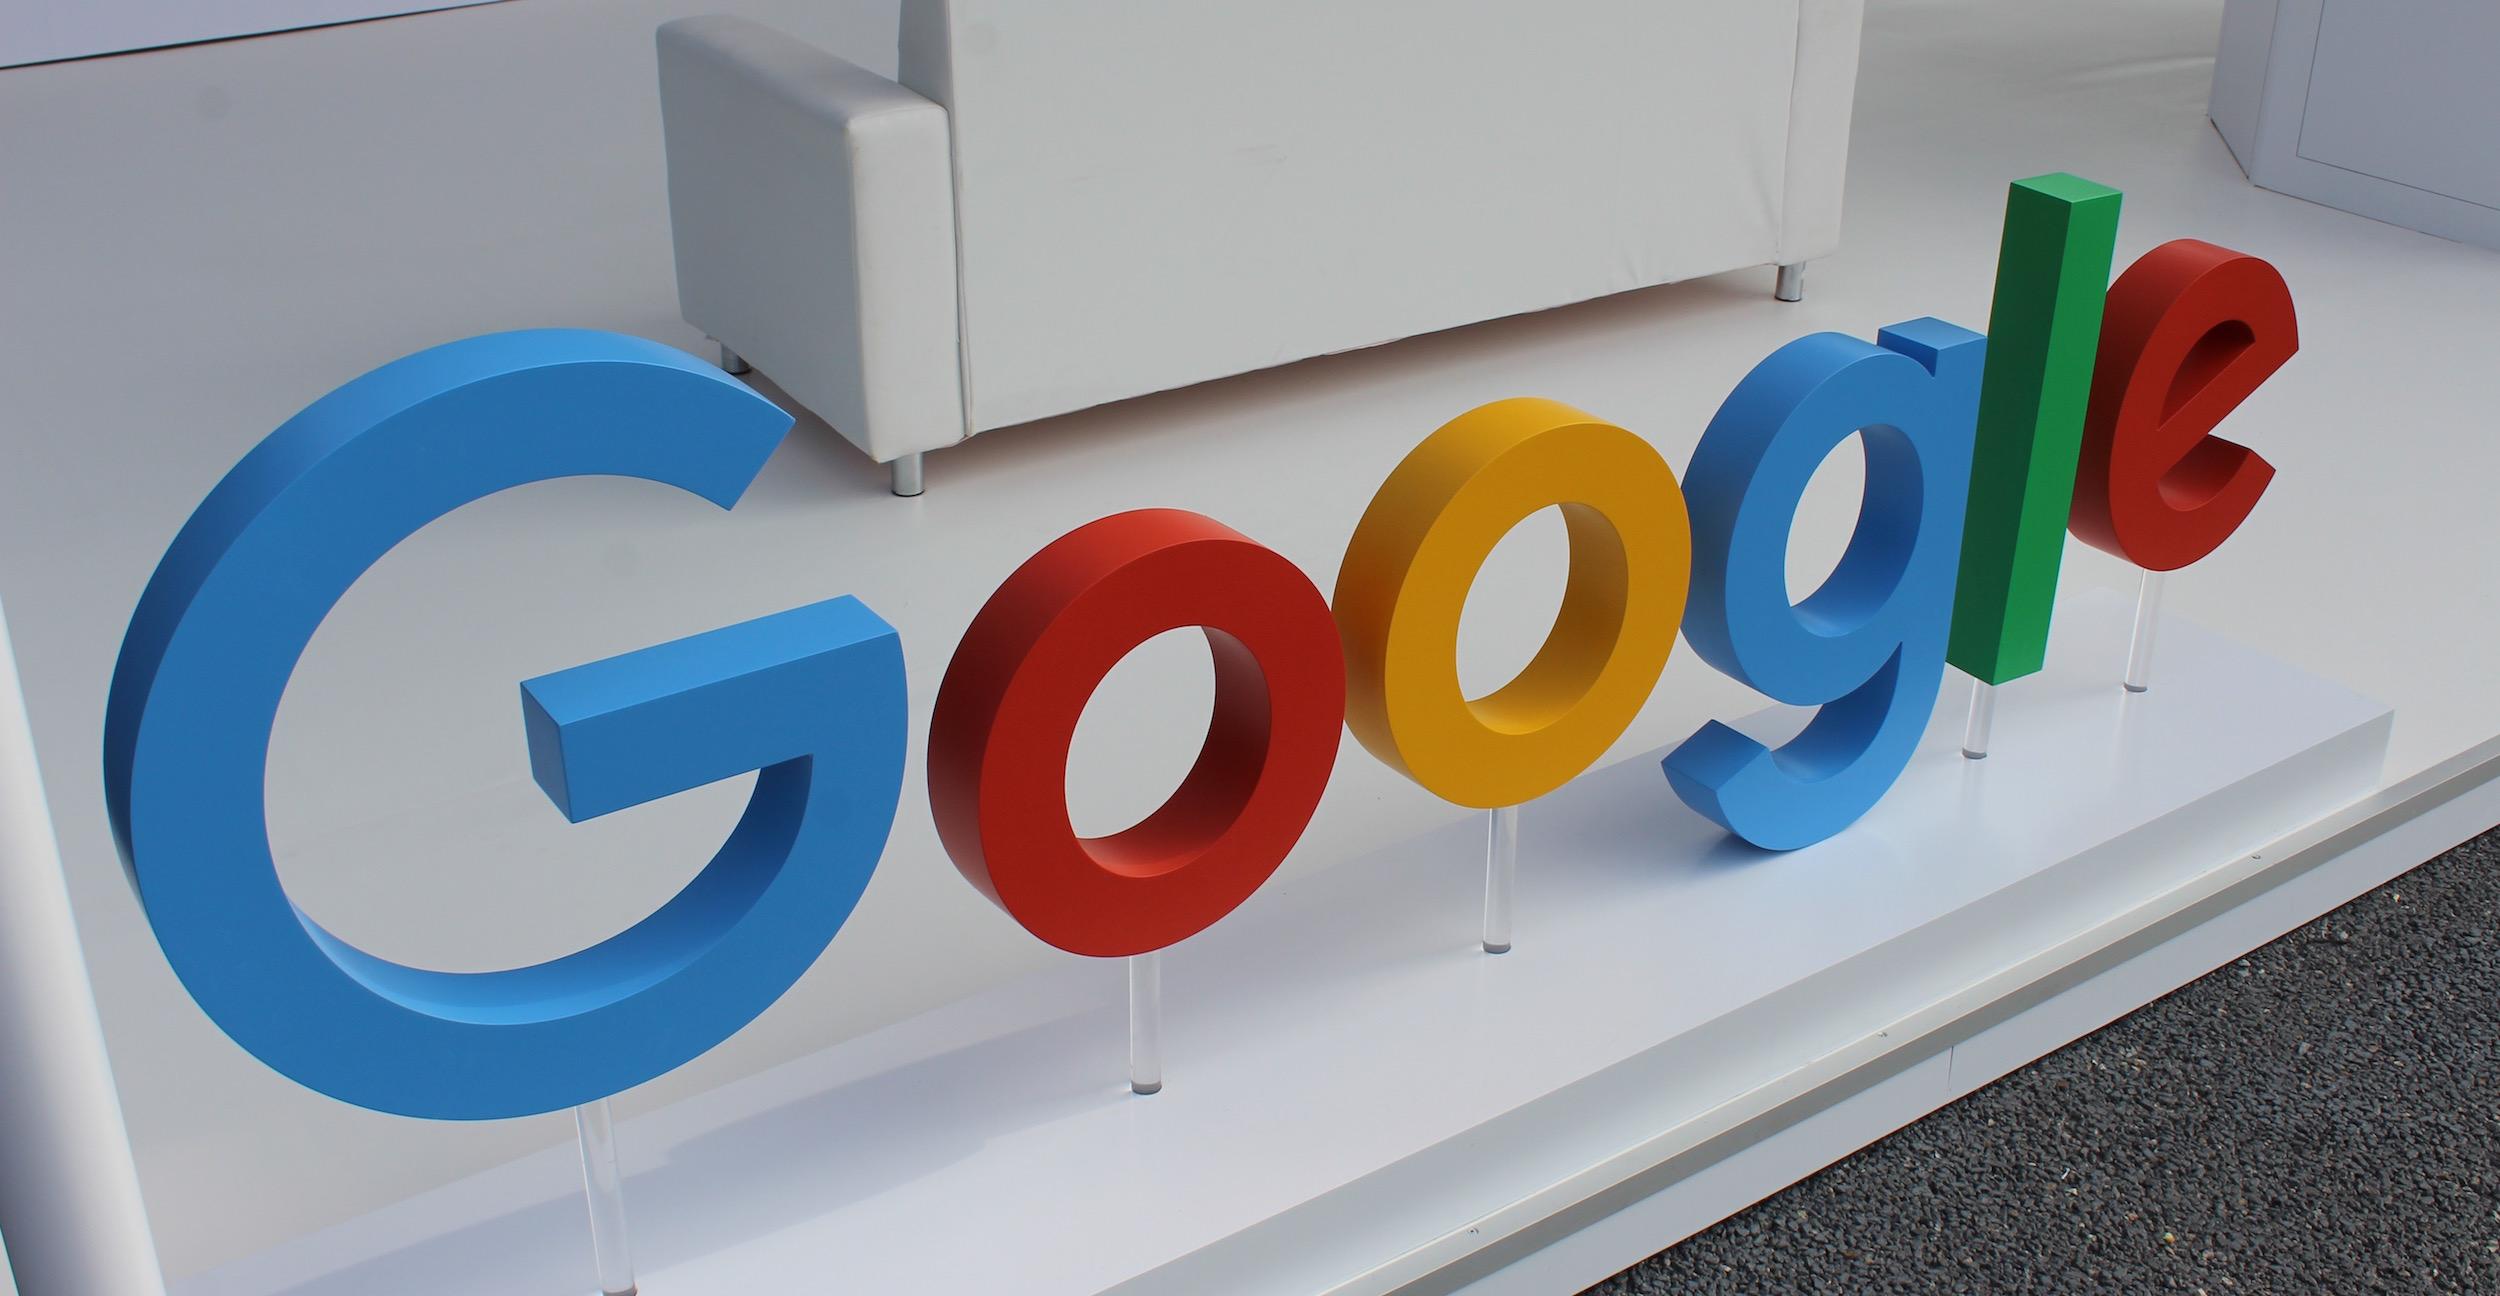 Google investigado por la agencia tributaria espa ola en for Oficina tributaria madrid